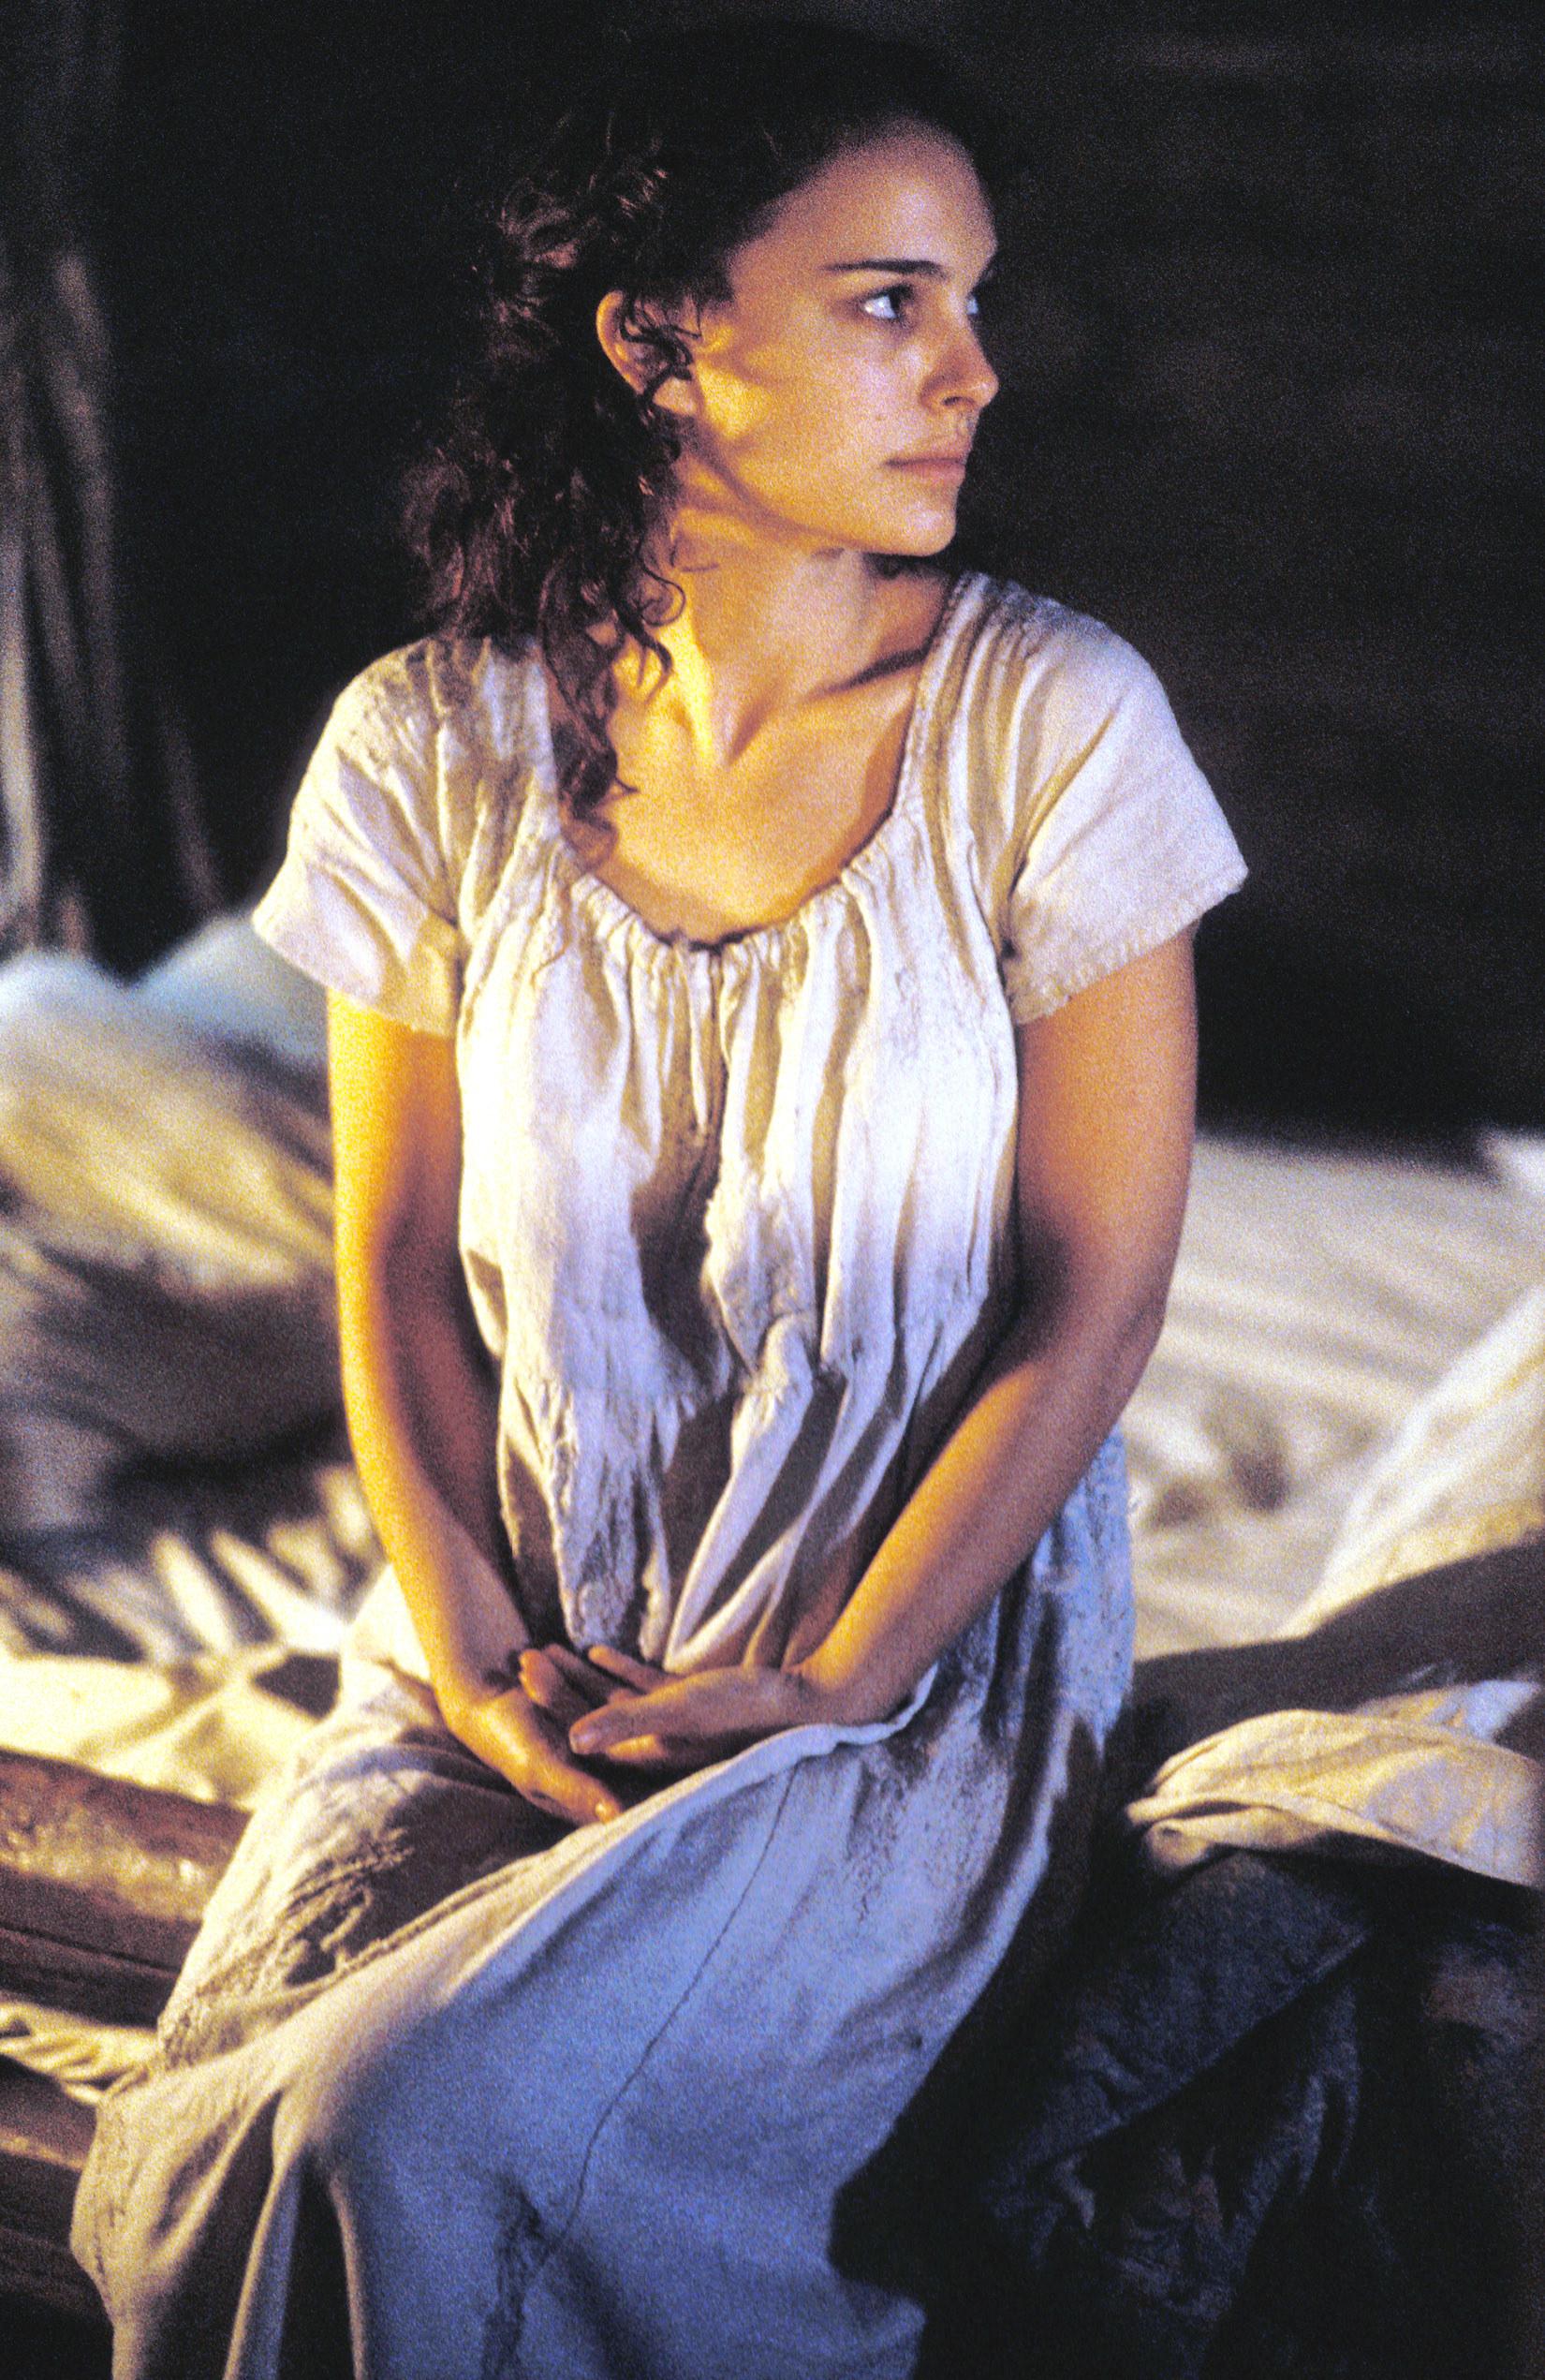 COLD MOUNTAIN, Natalie Portman, 2003